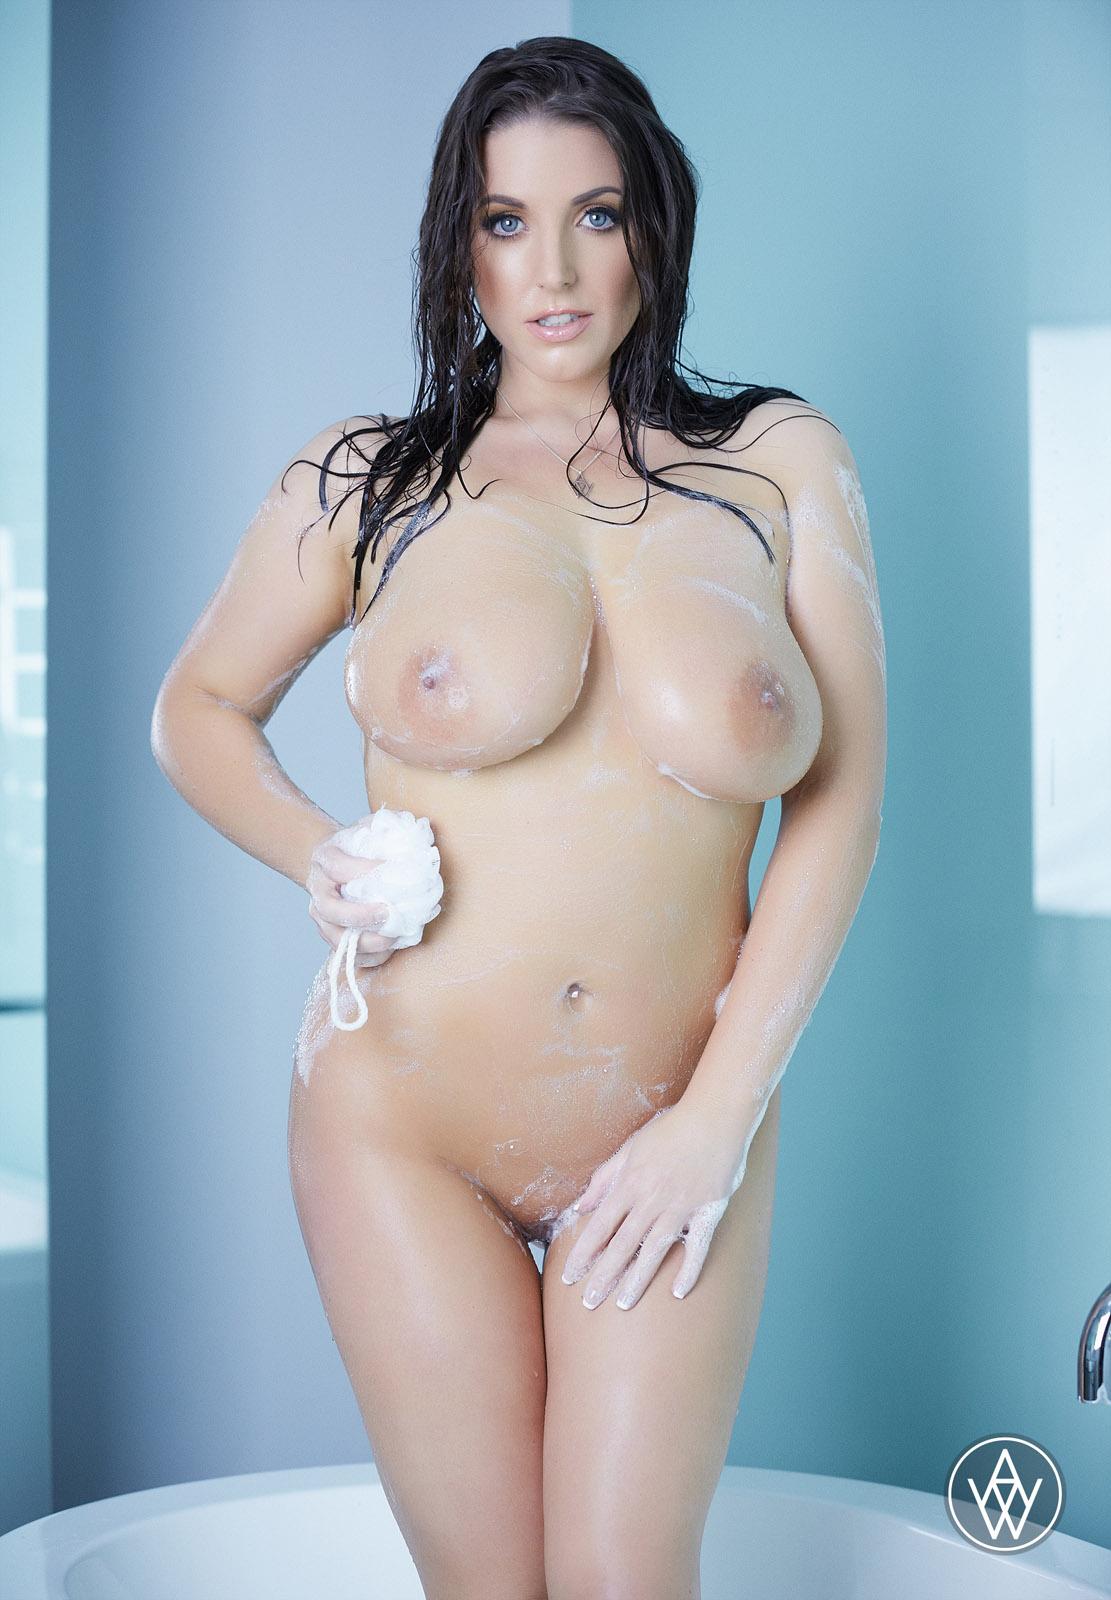 Angela White Bath Tub Romp Prime Curves